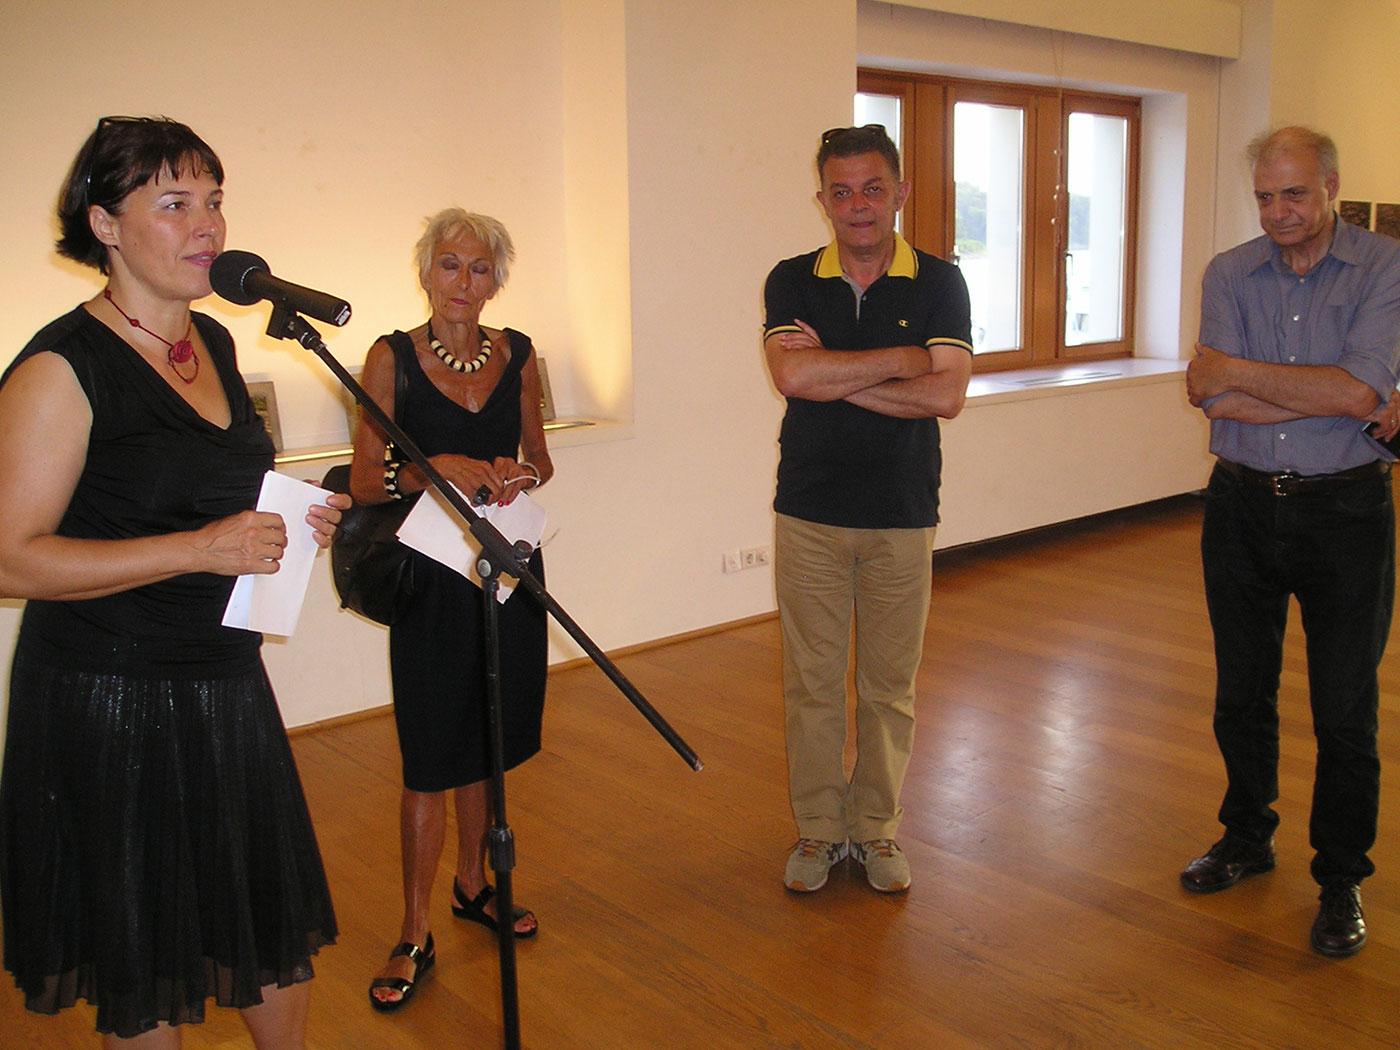 Mostra dell'artista maceone Jovan Šumkovski al CMM